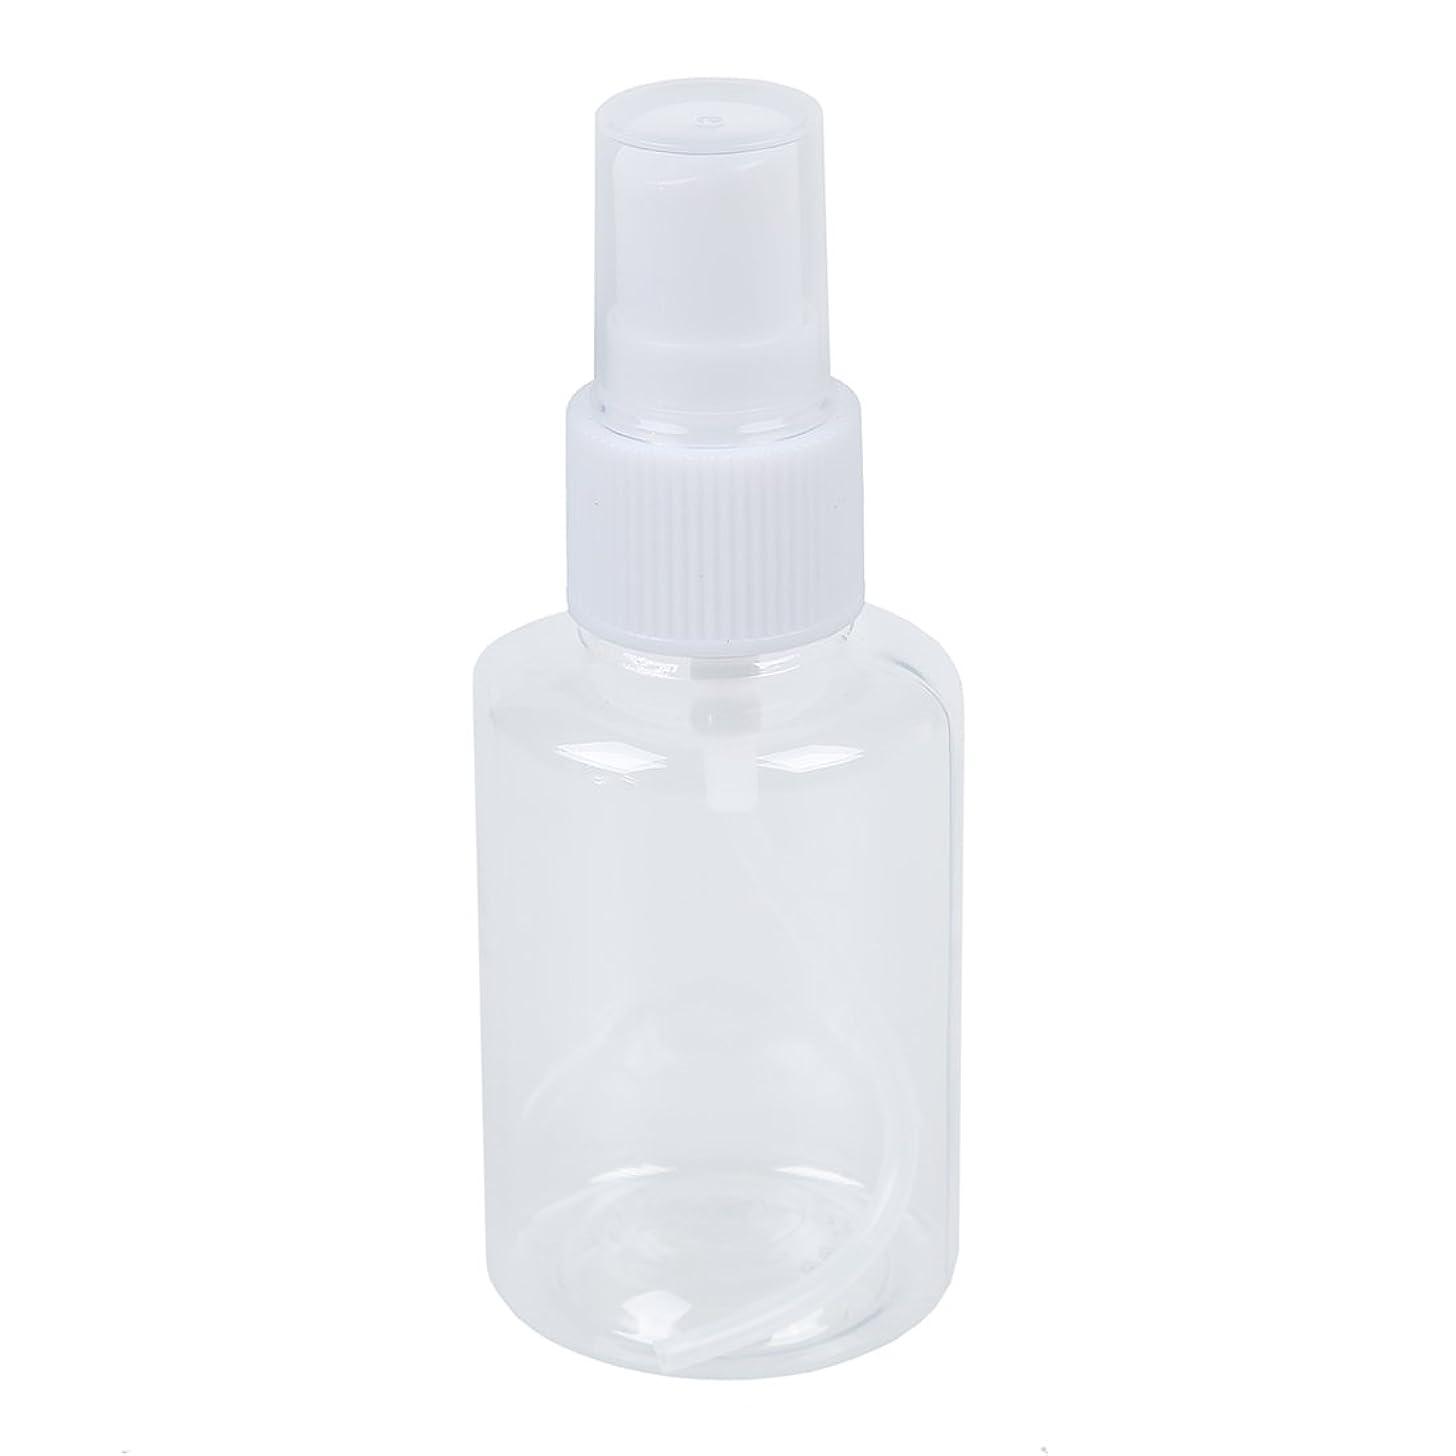 Gaoominy Gaoominy(R)50ml香水アトマイザーメイクアップ化粧品スプレーボトルホワイトクリア2PCS